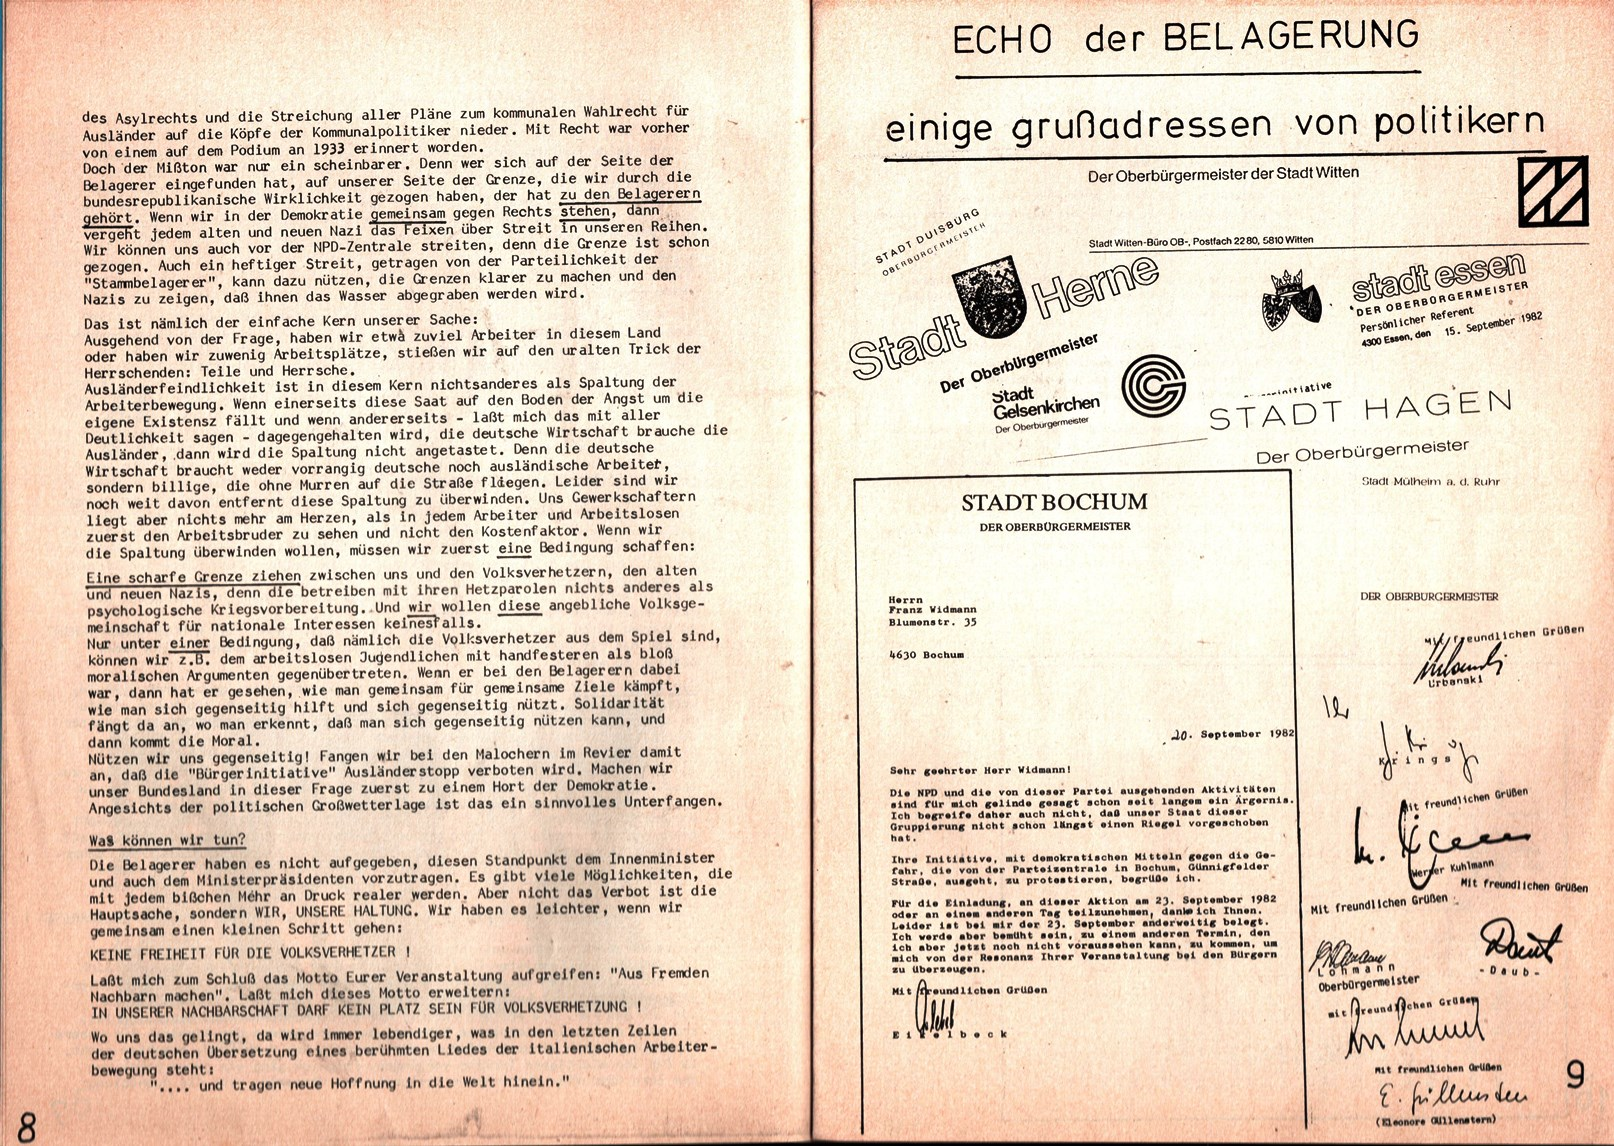 Bochum_1982_BI_Auslaenderstopp_belagern_006